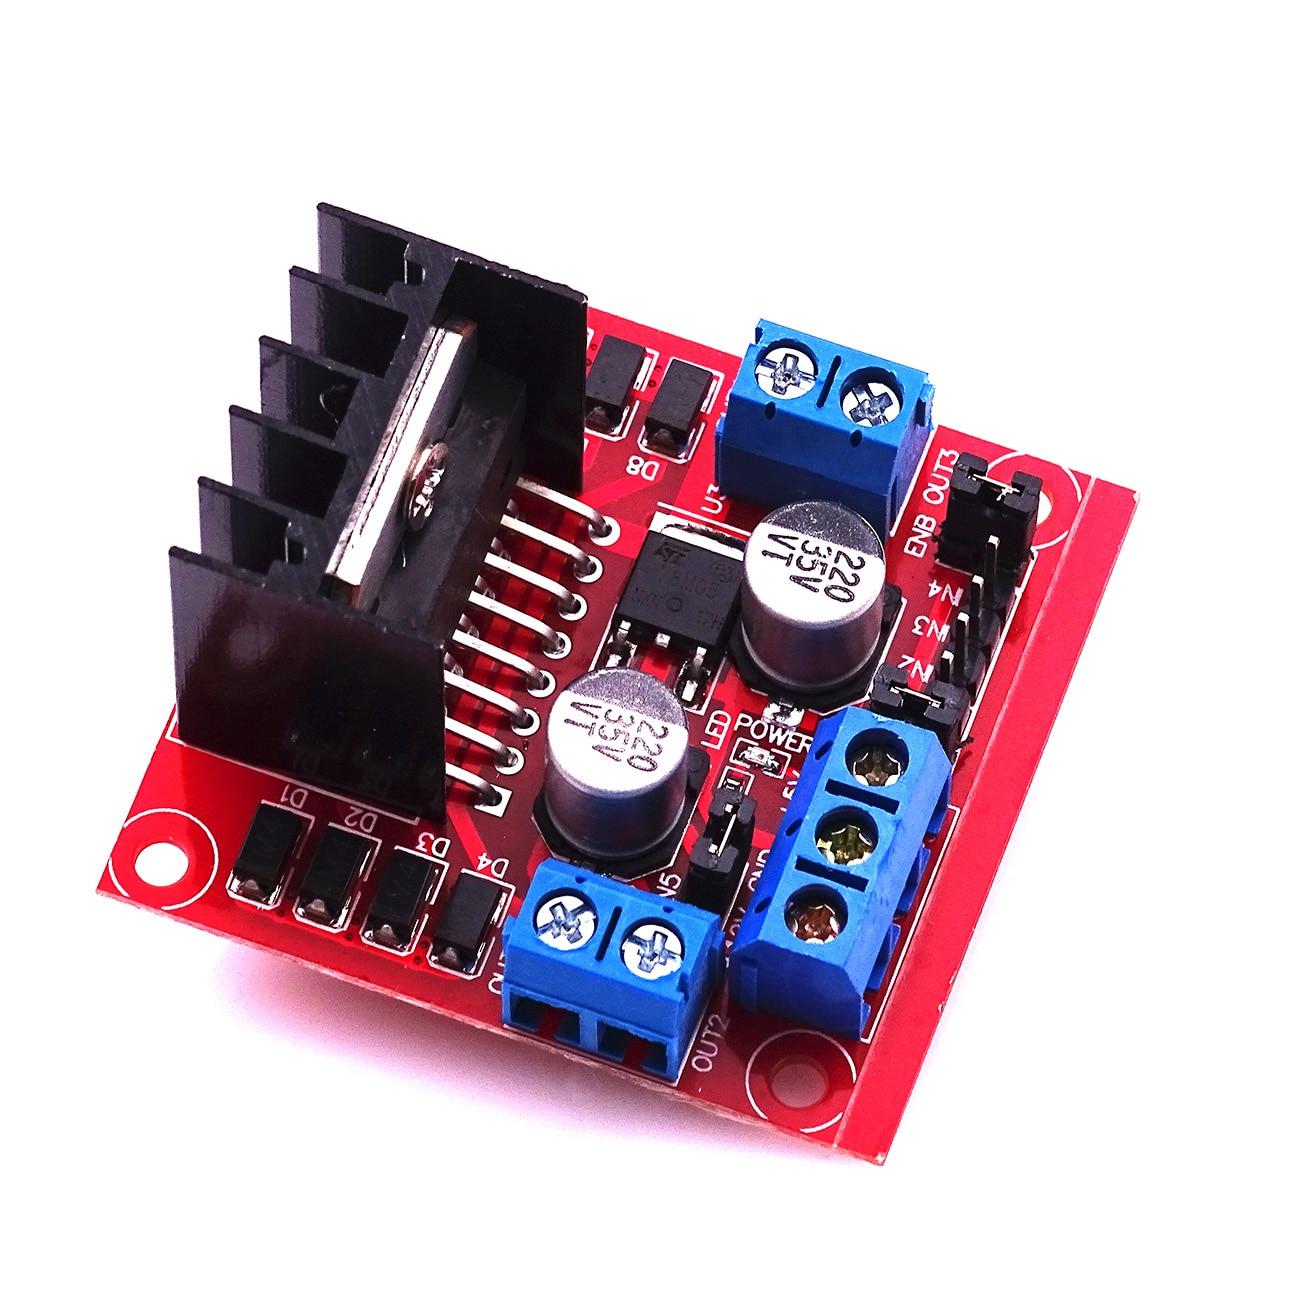 Pcs l n motor driver board module for arduino